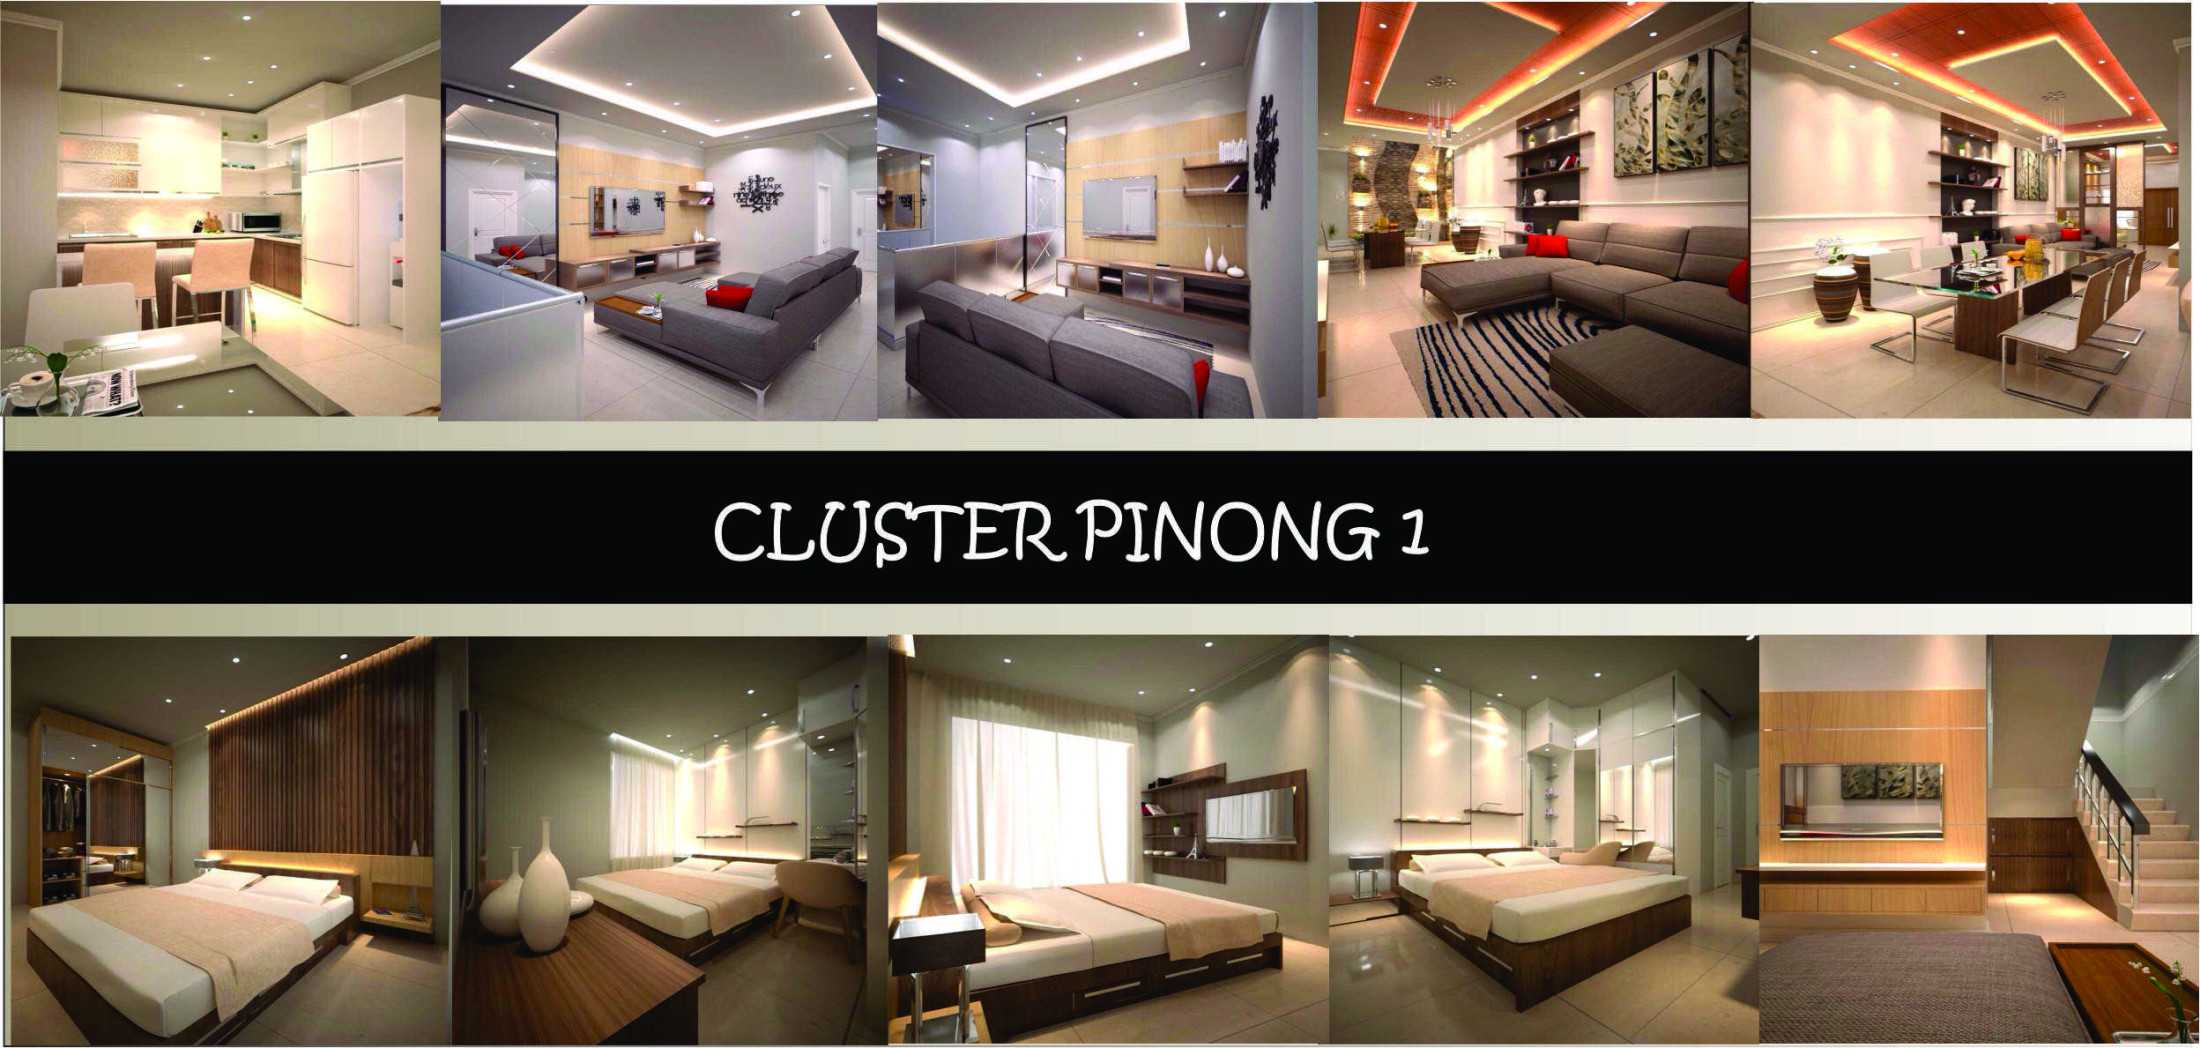 Mozaik Interior Cluster Pinong 1 Serpong, Kota Tangerang Selatan, Banten, Indonesia Serpong, Kota Tangerang Selatan, Banten, Indonesia Mozaik-Interior-Cluster-Pinong-1  56856